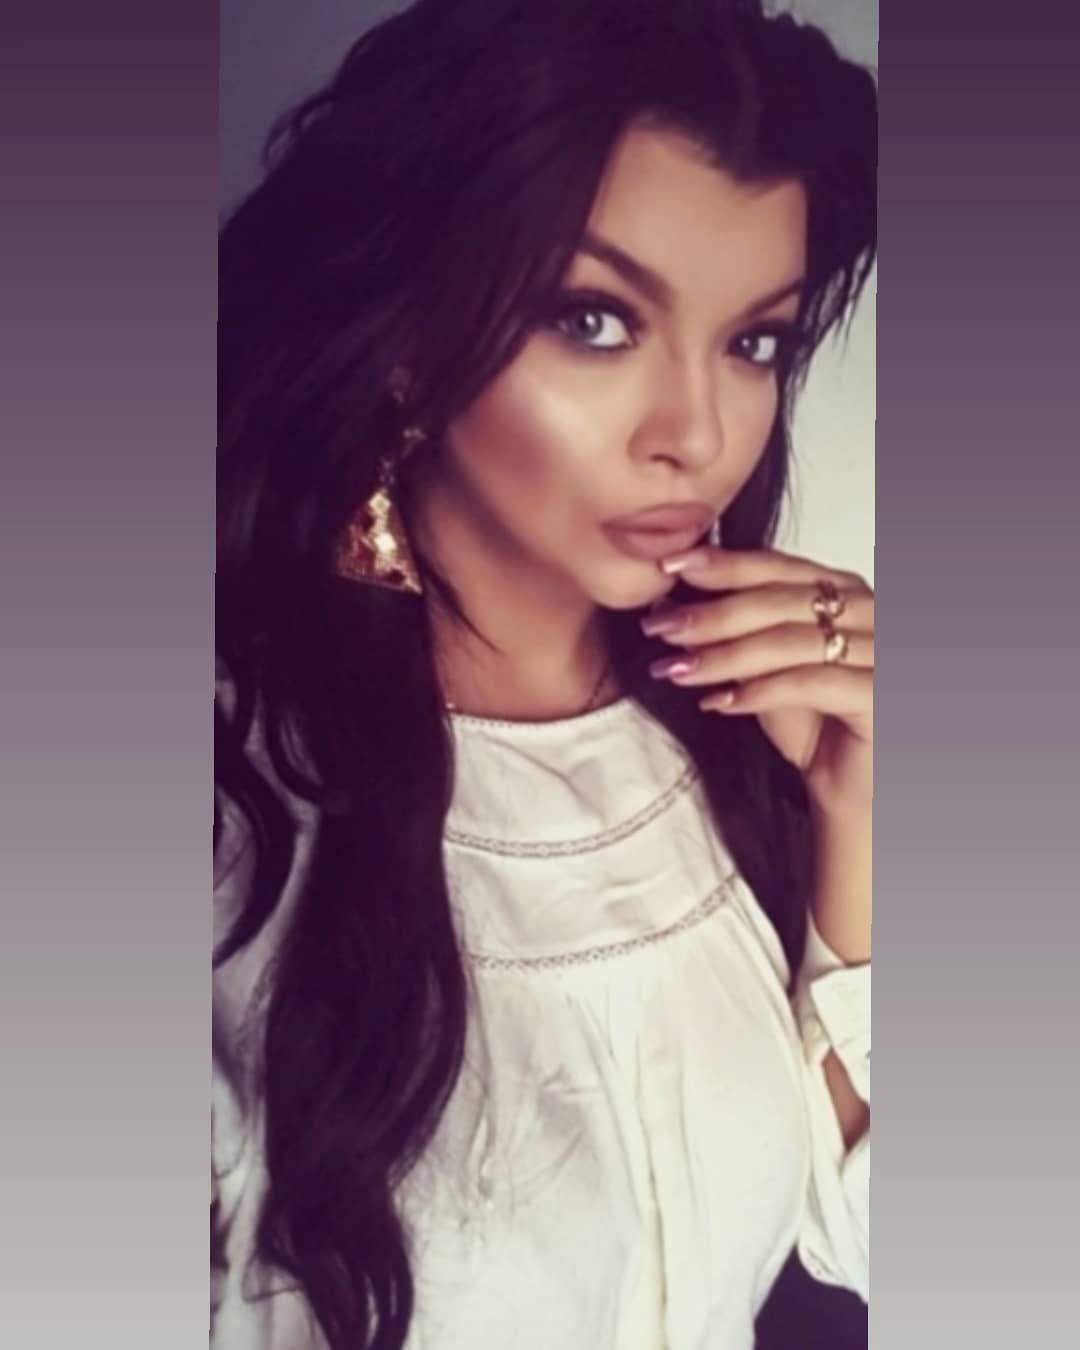 Polishgirl Women Brunette Curlyhair Selfie Instaphoto Kielce